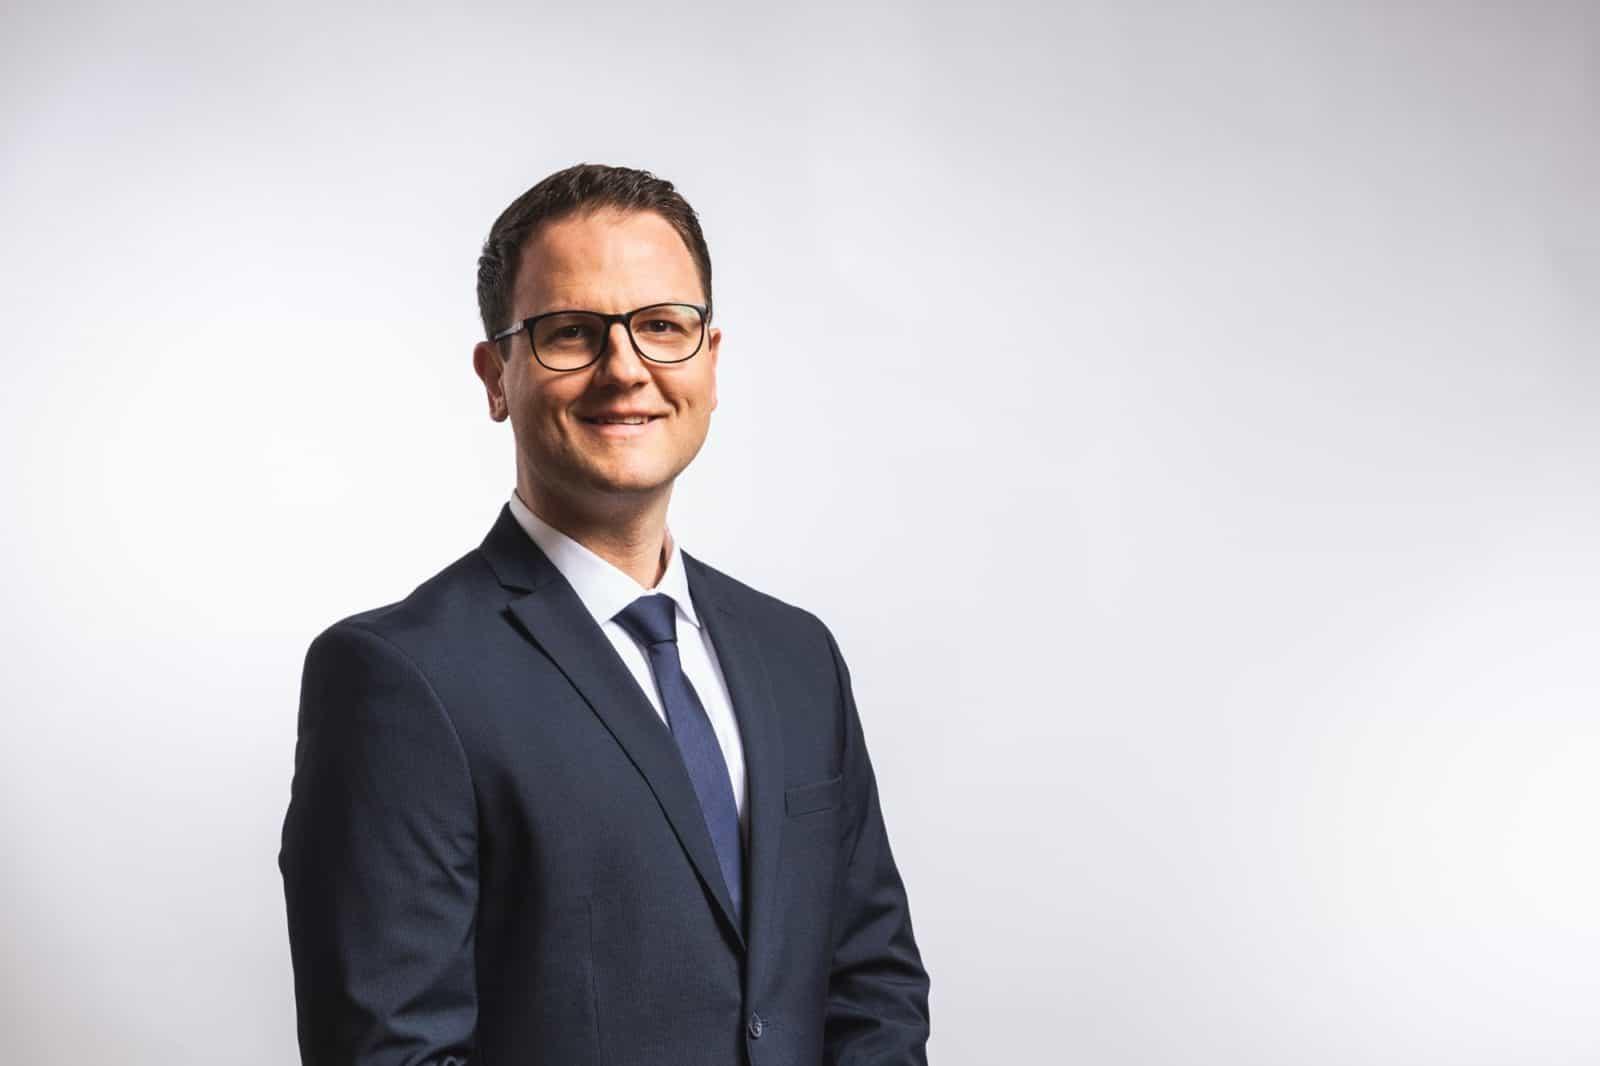 Christian Buchegger